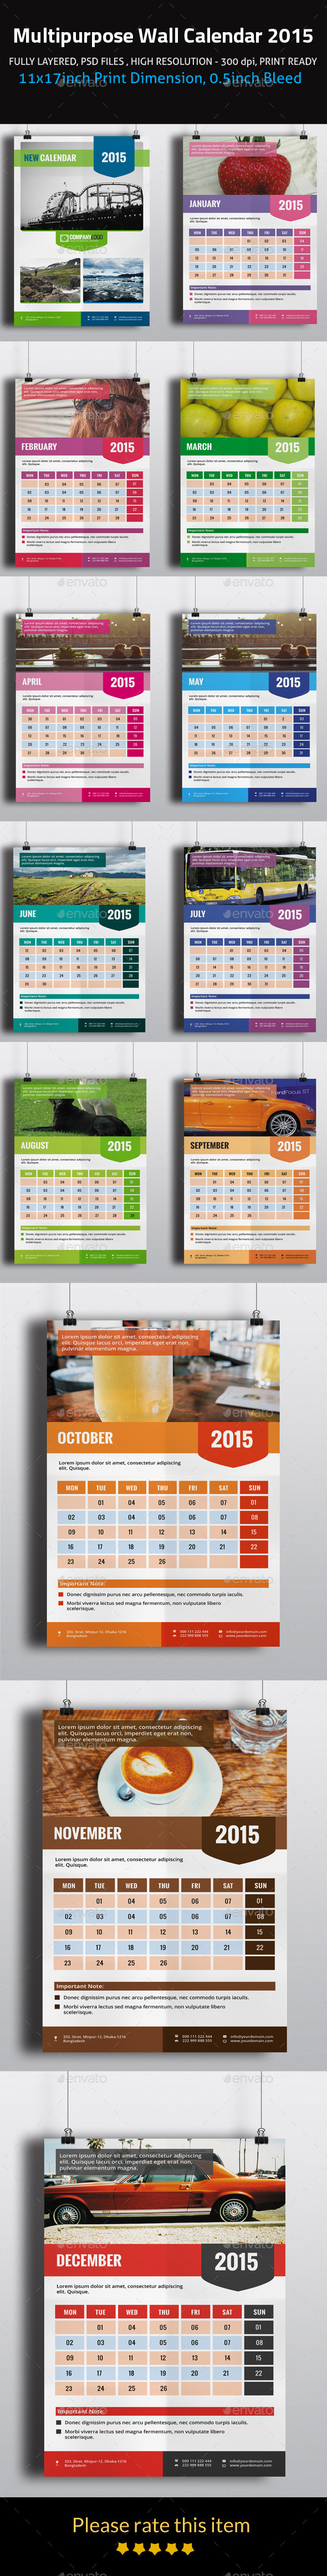 Multipurpose Wall Calendar 2015 - Calendars Stationery